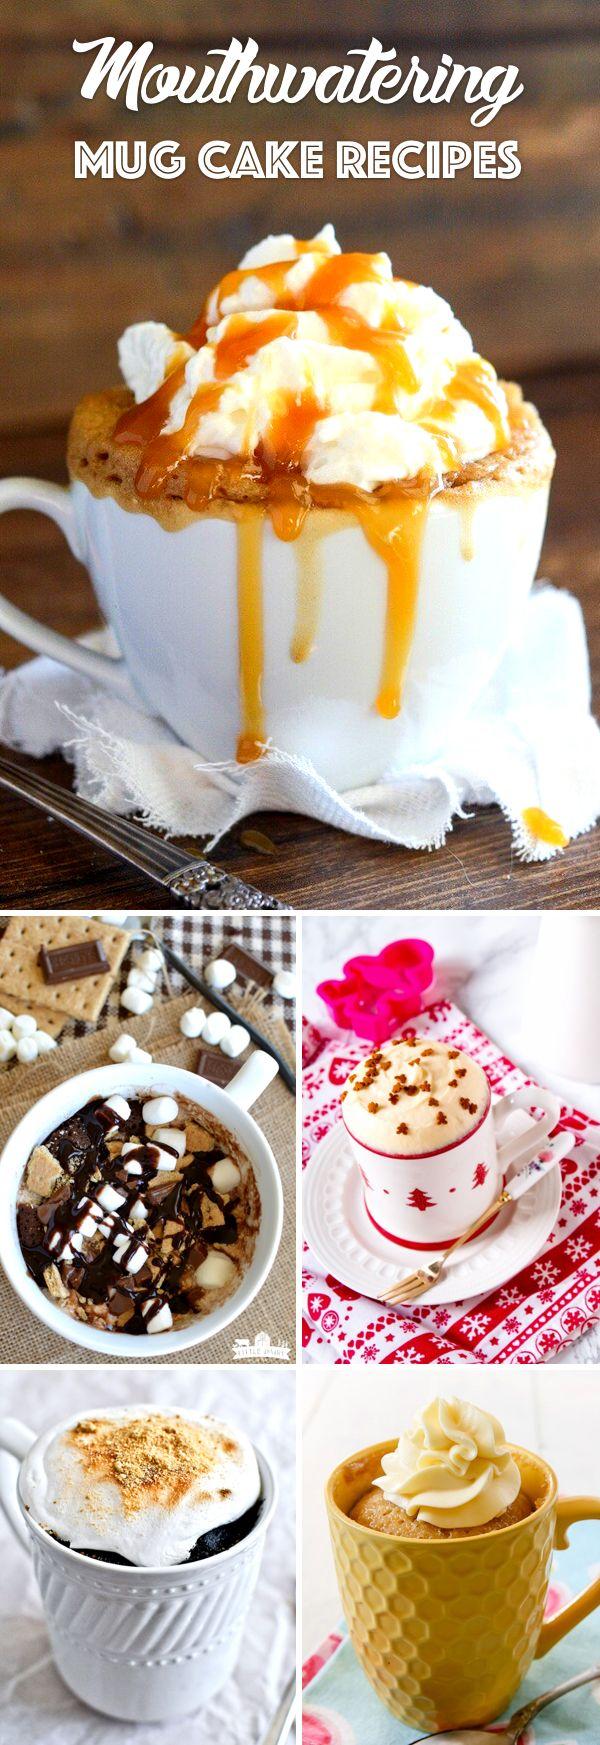 35 Mouthwatering Mug Cake Recipes To Prepare a Single ...